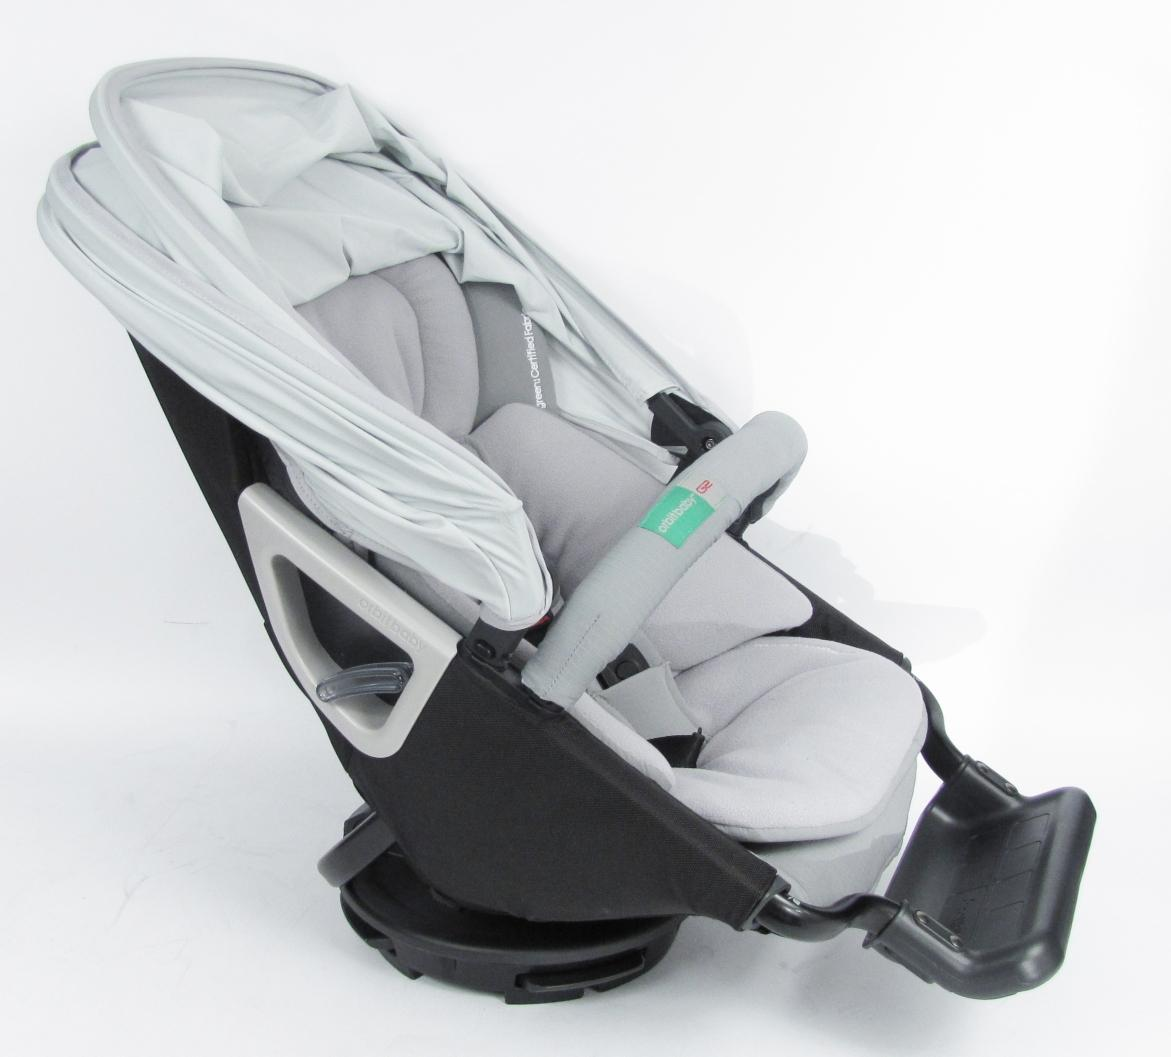 displaying 15 images for gucci baby car seat car interior design. Black Bedroom Furniture Sets. Home Design Ideas